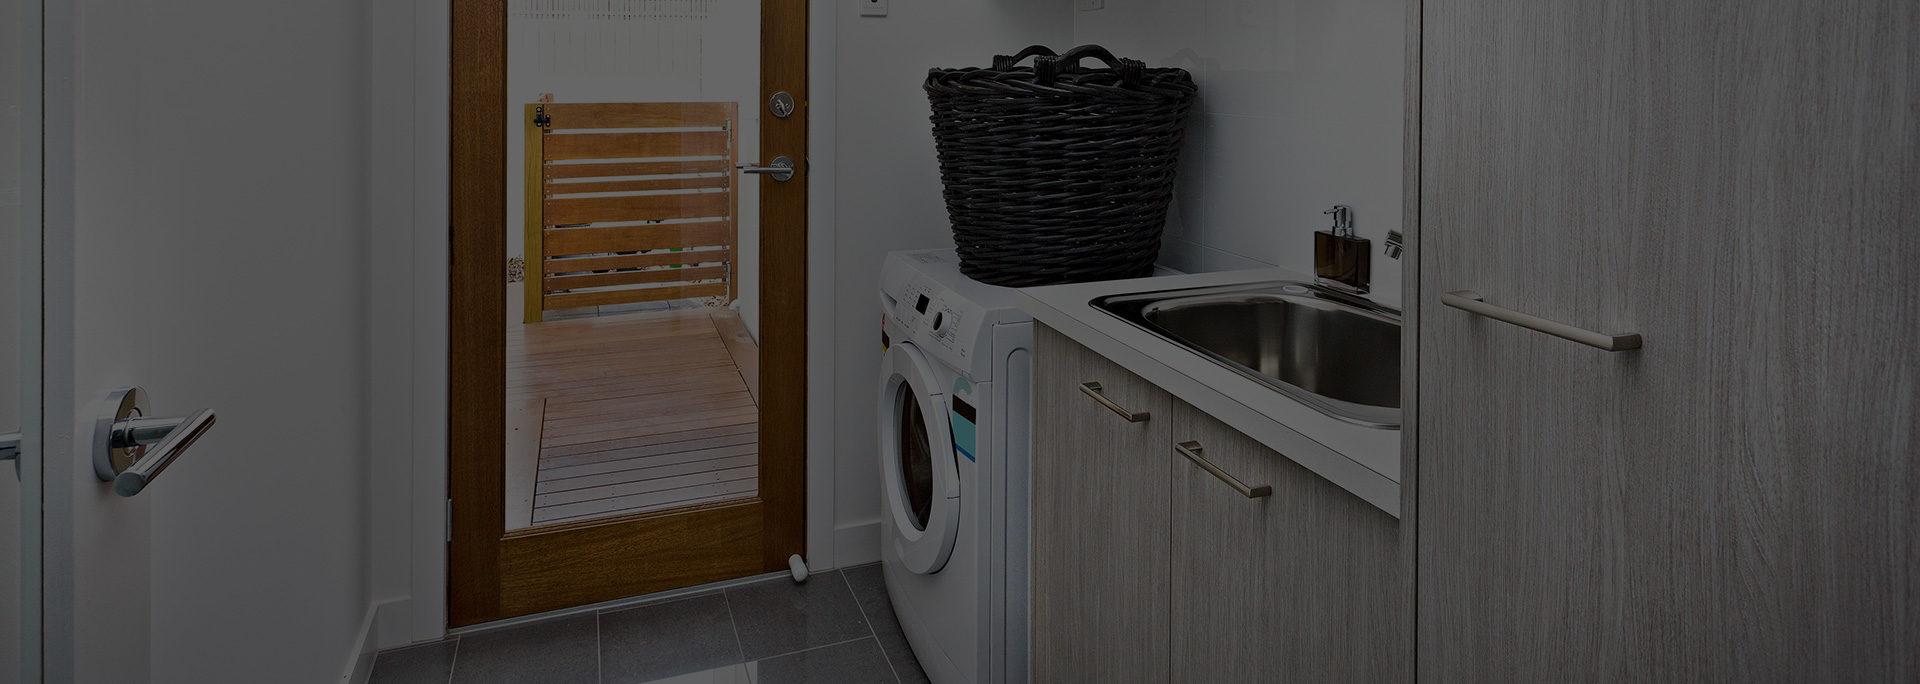 Laundry Planning